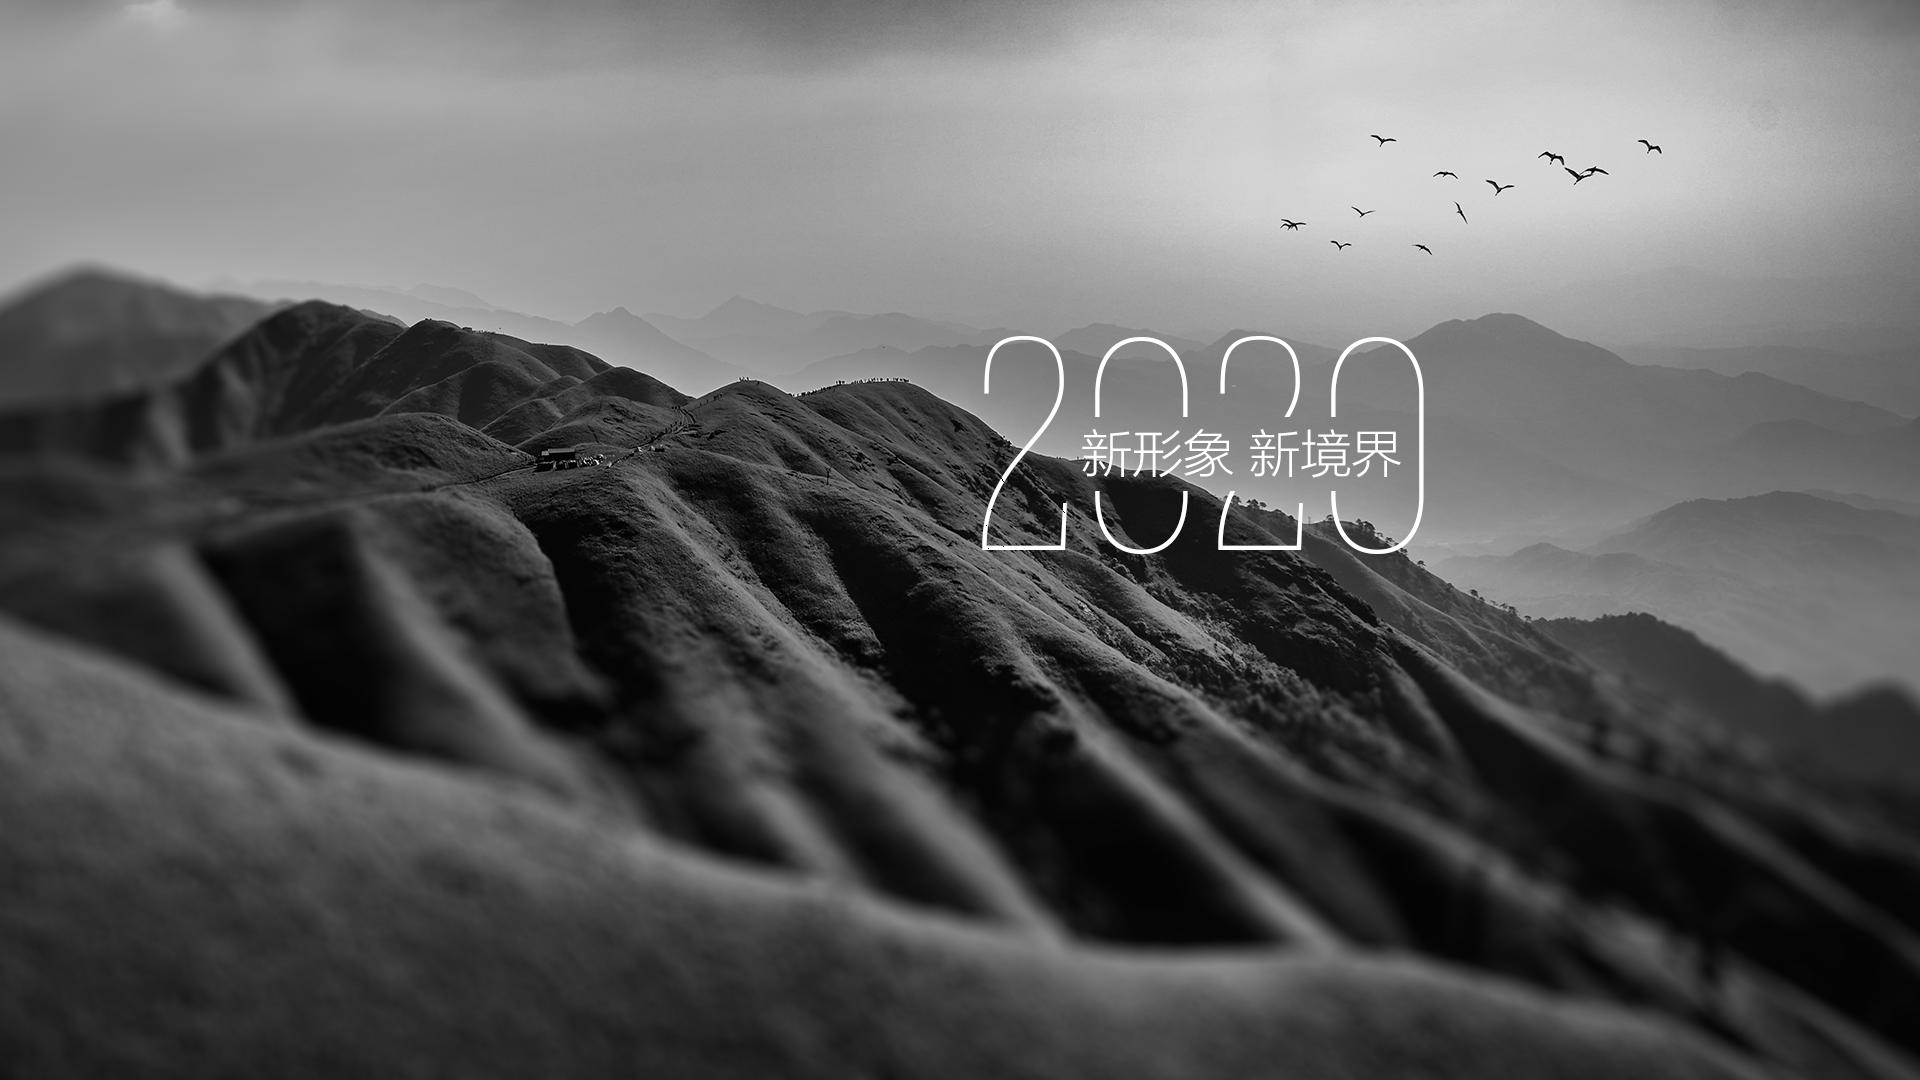 2020DOTON新形象新境界